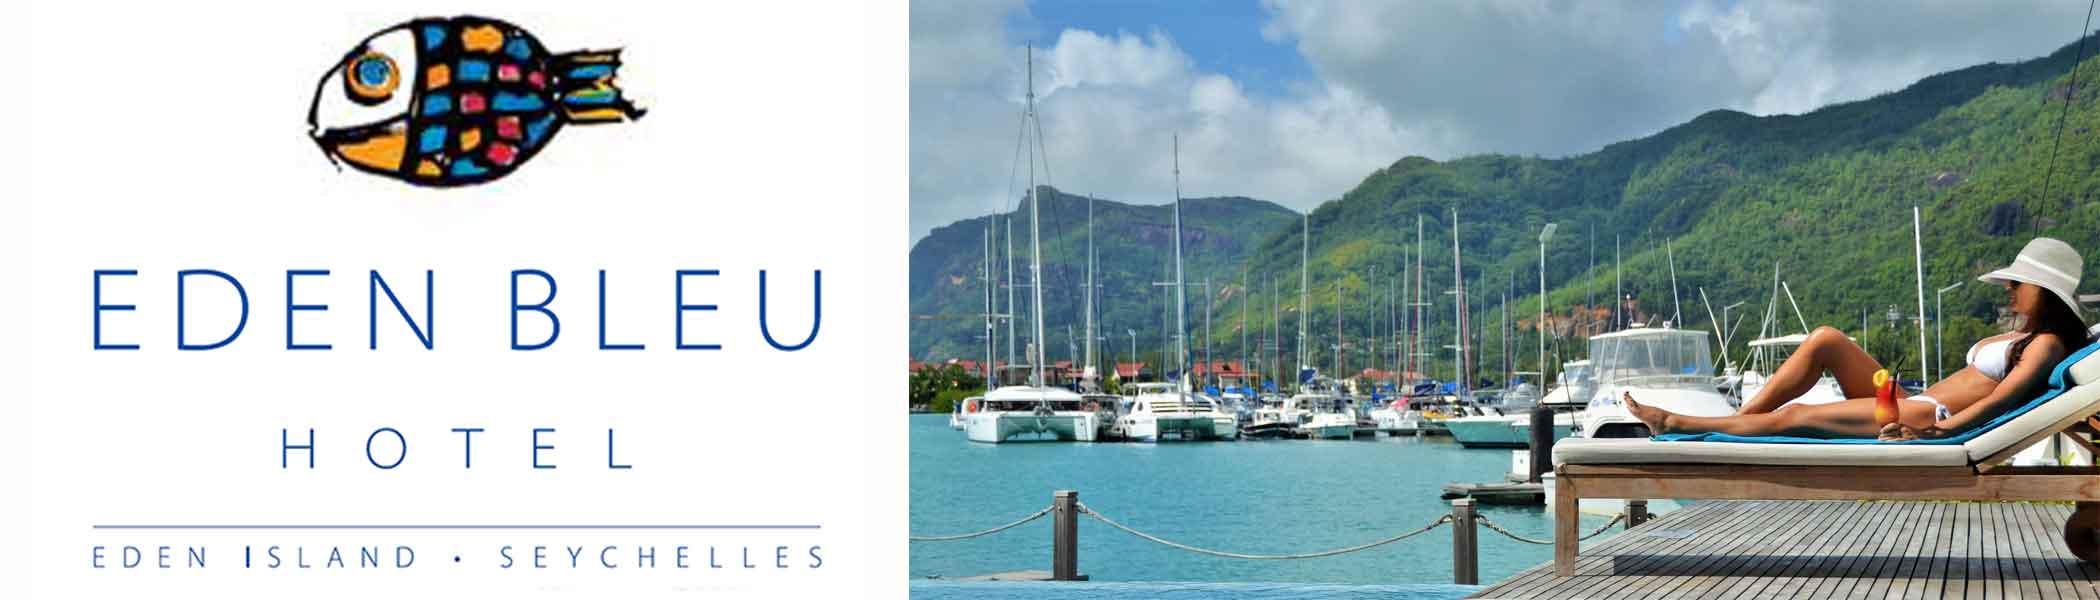 eden-bleu-hotel, Hotels in Seychelles Islands